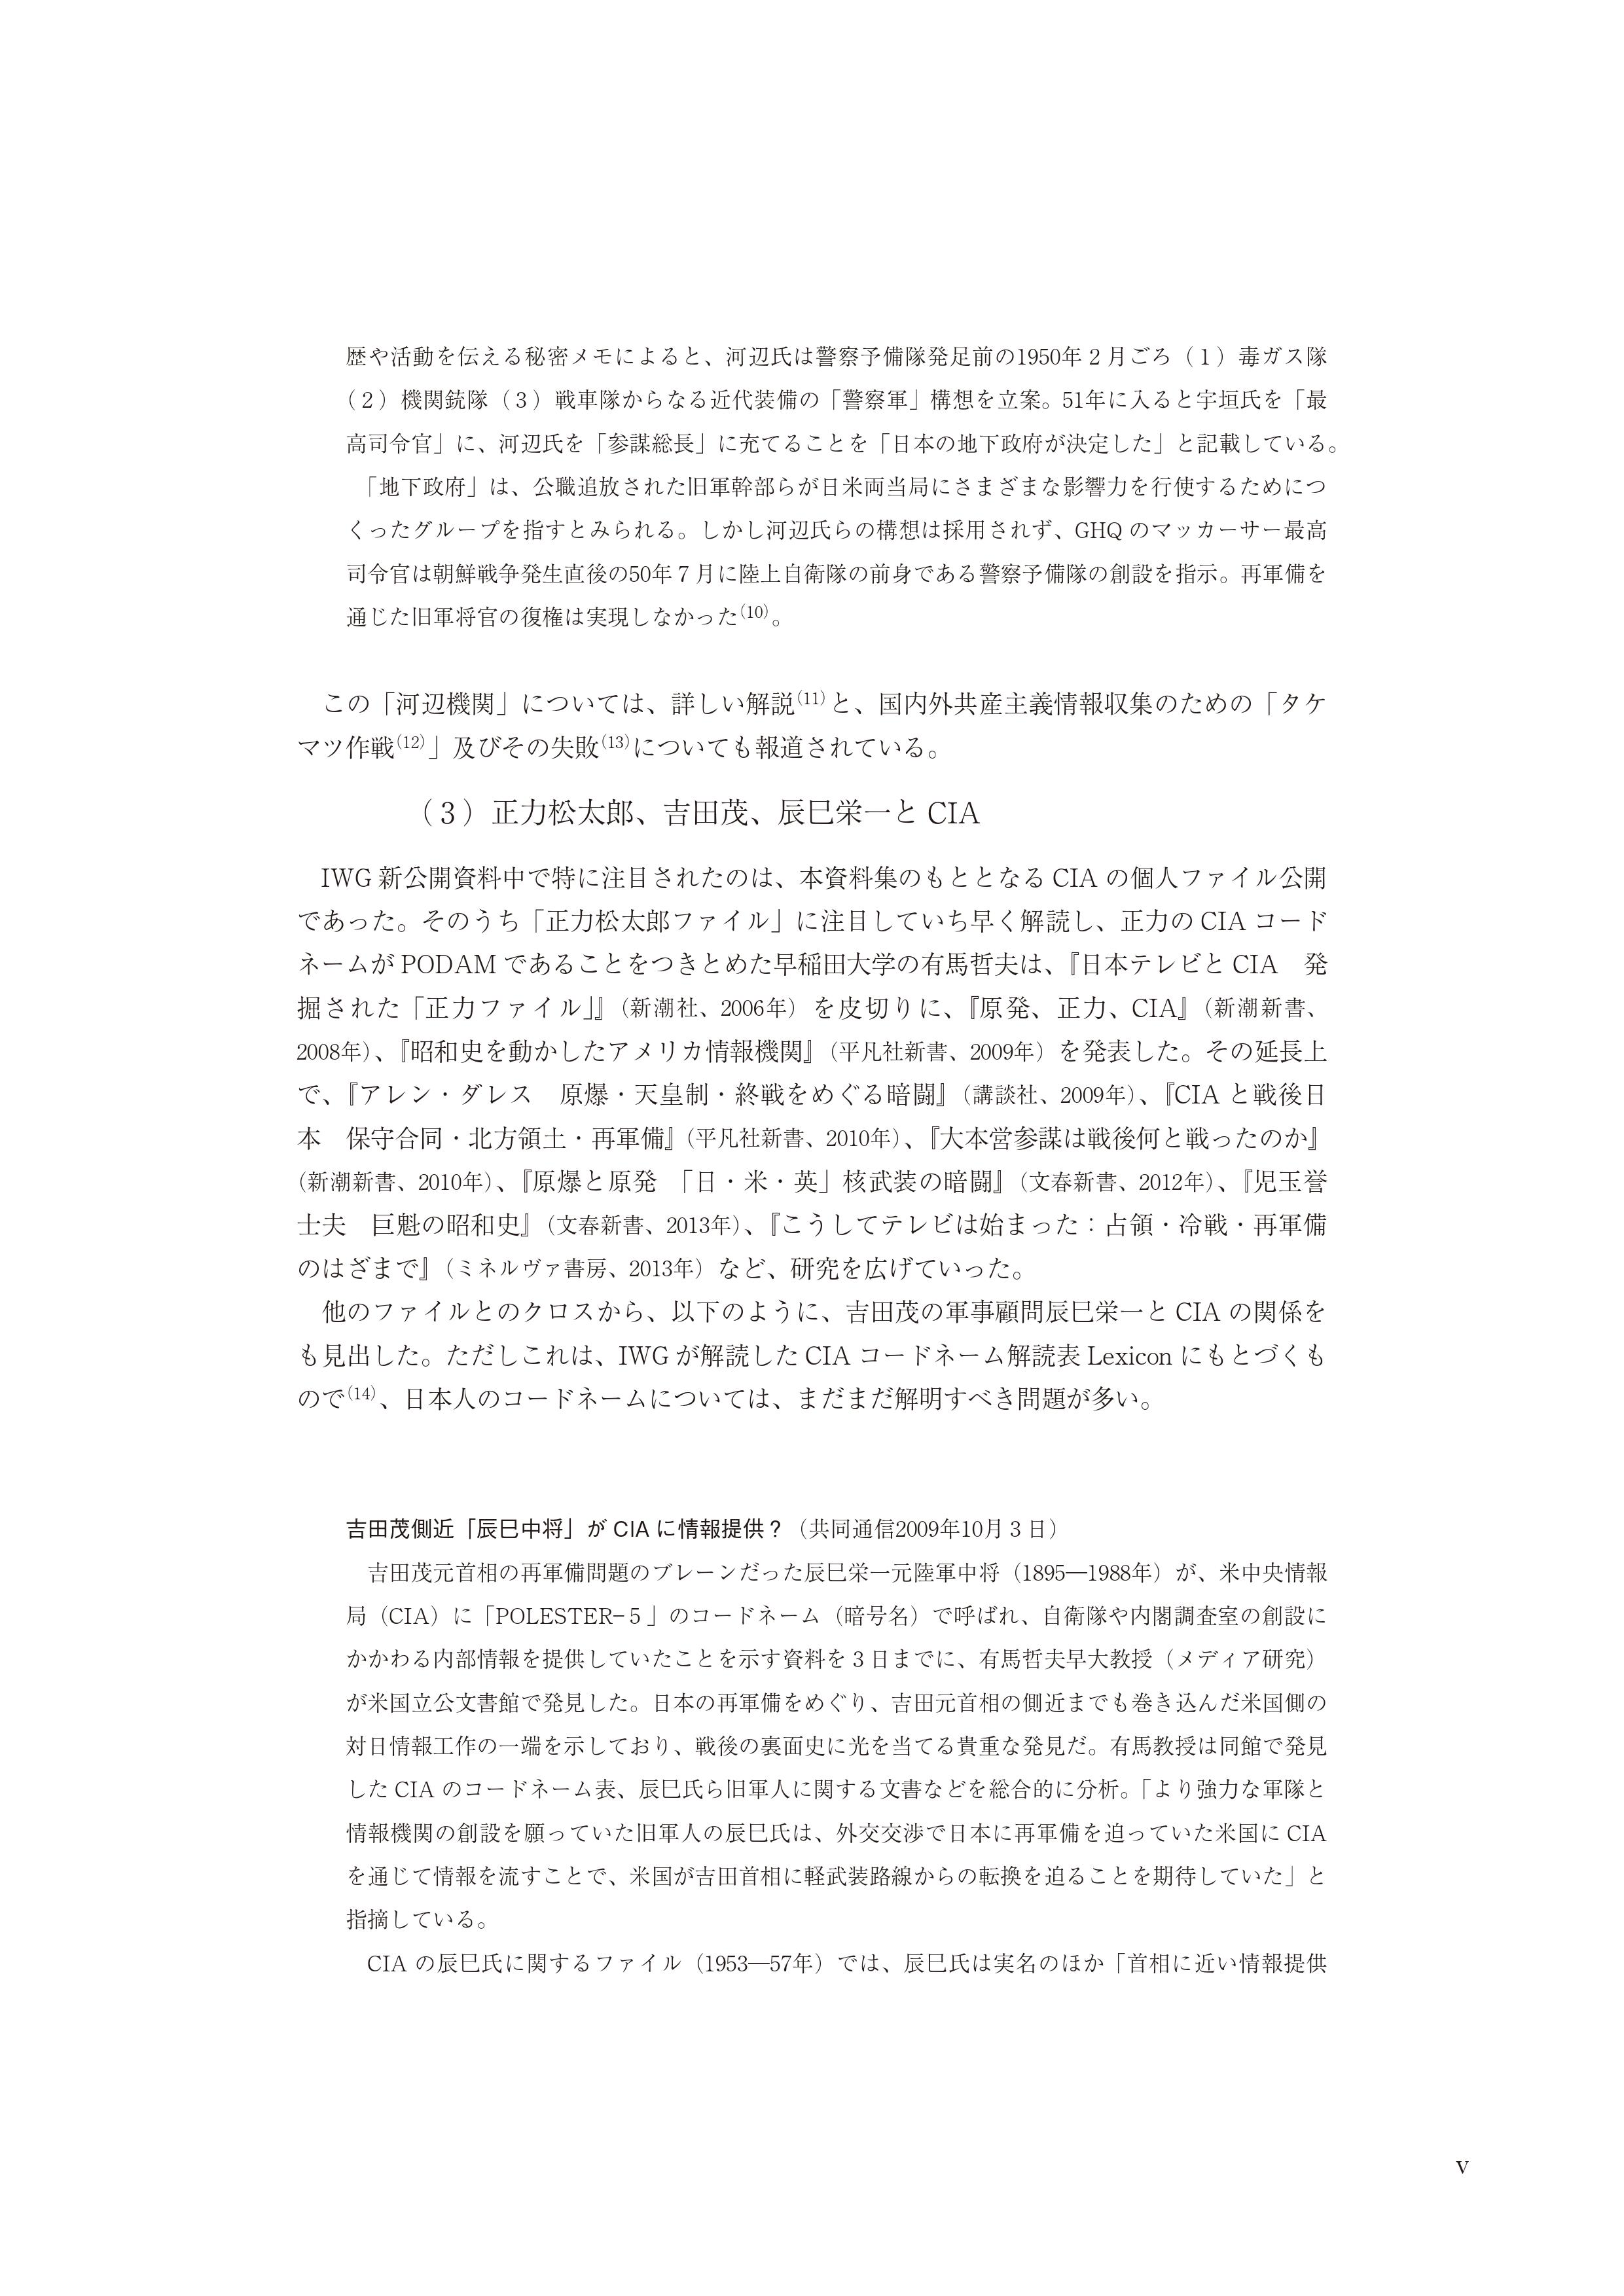 CIA日本人ファイル0001 (5)